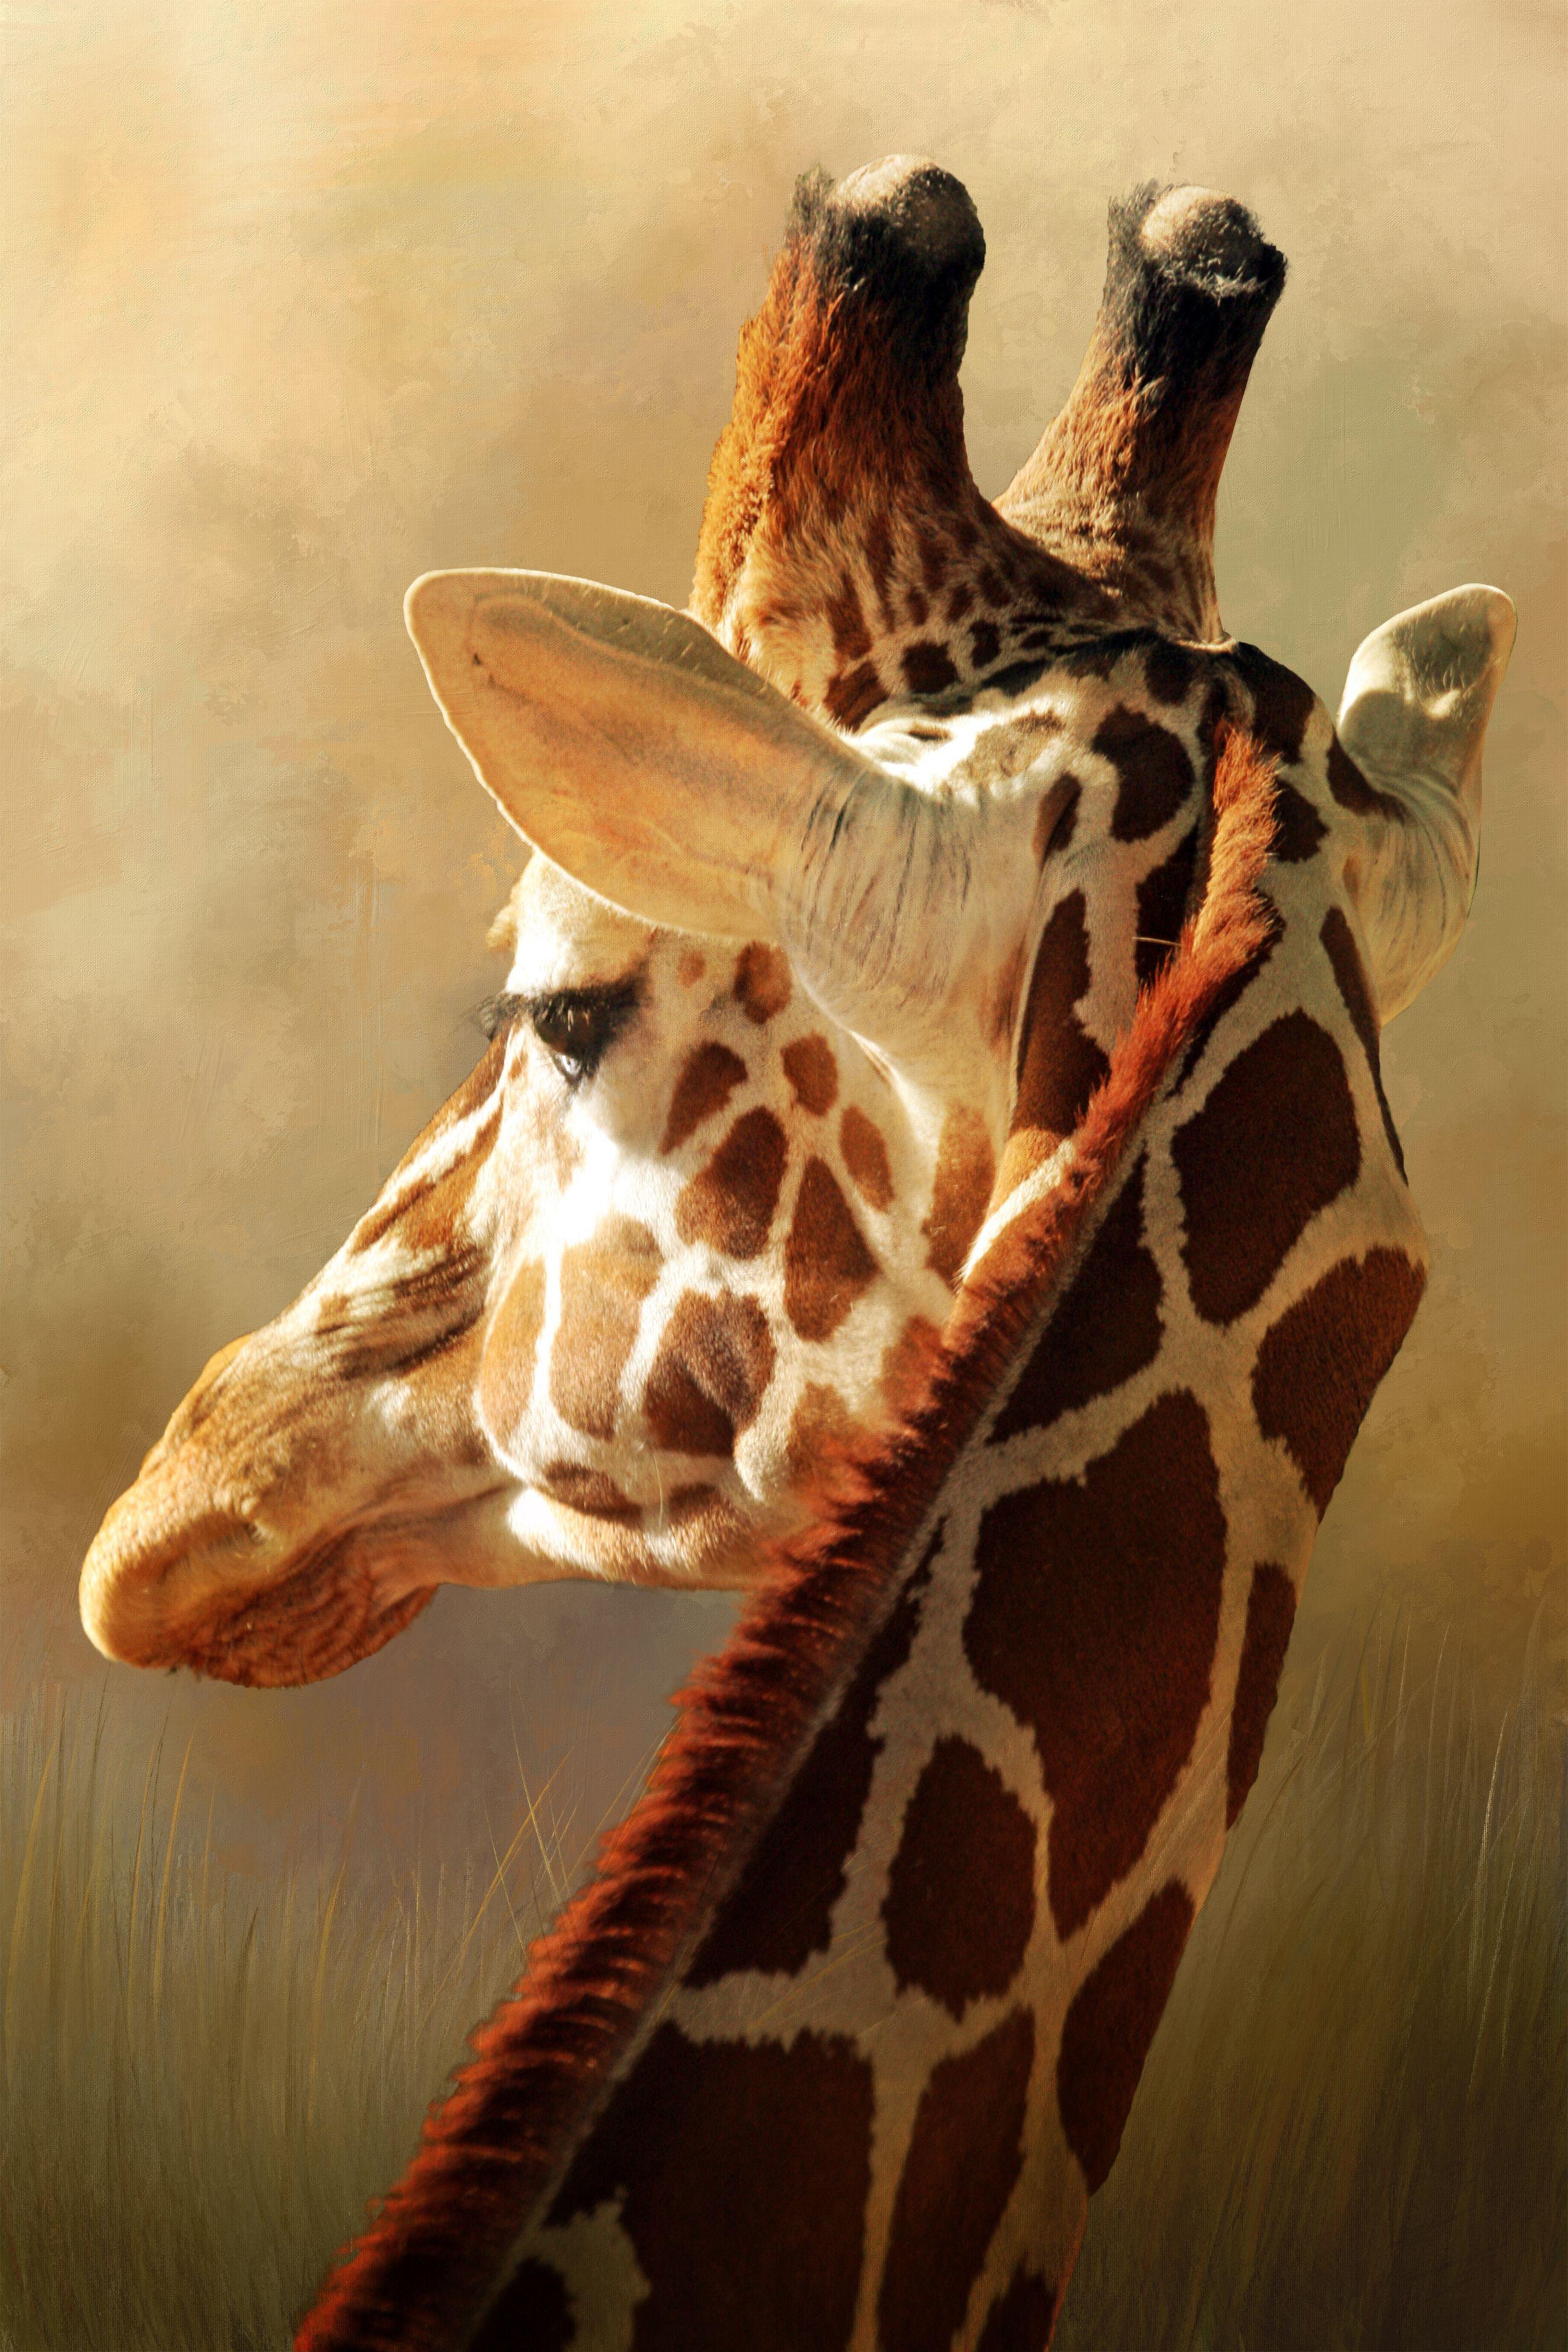 Giraffe, Tucson Zoo Giraffe, Animal parade, Urban icon